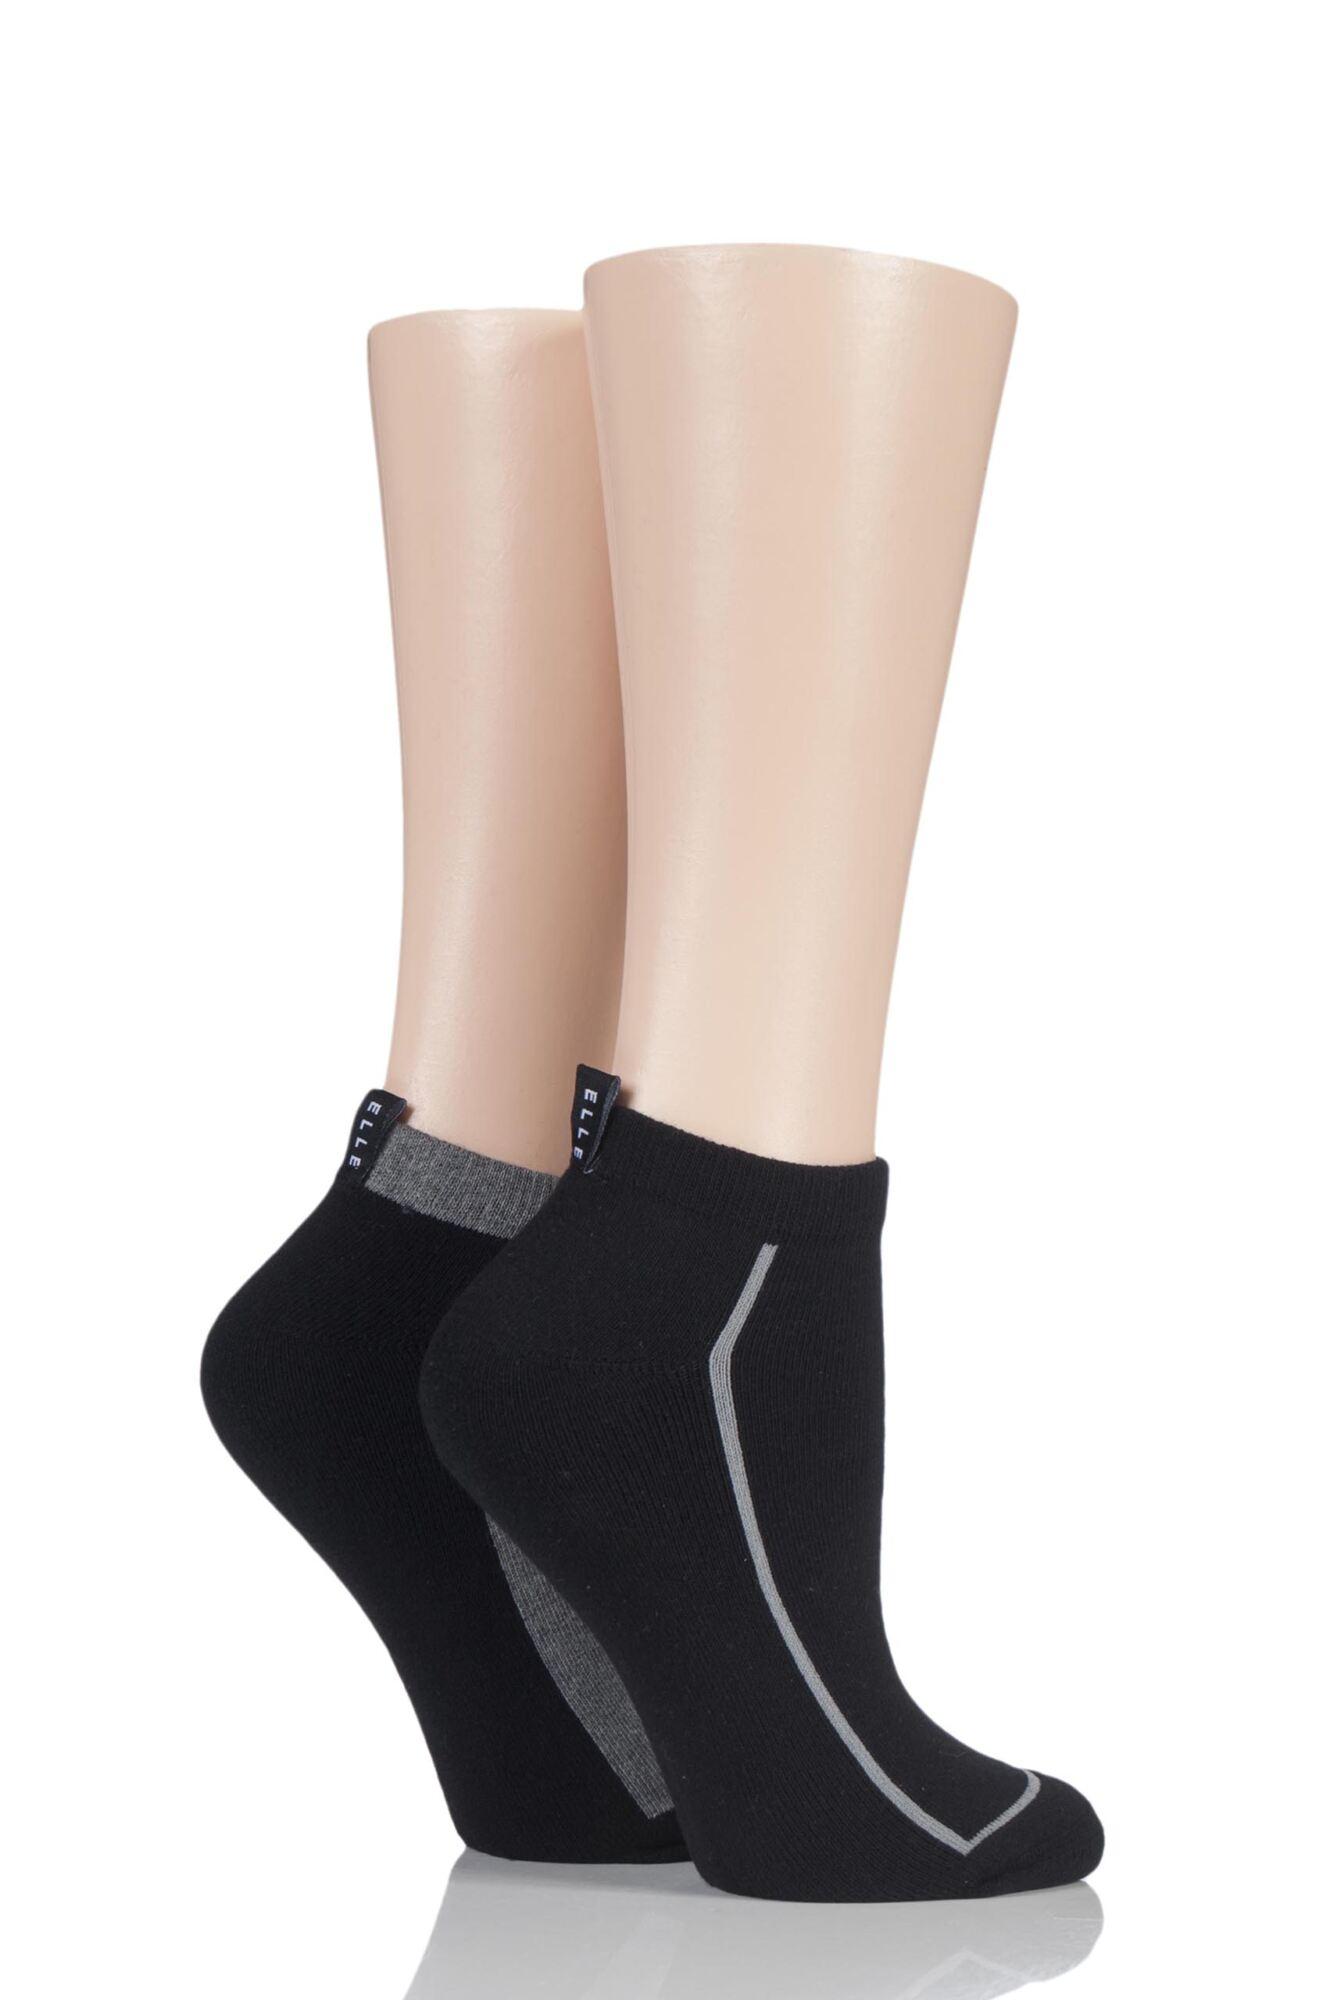 2 Pair Cushion Foot Trainer Socks With Liner Tag Ladies - Elle